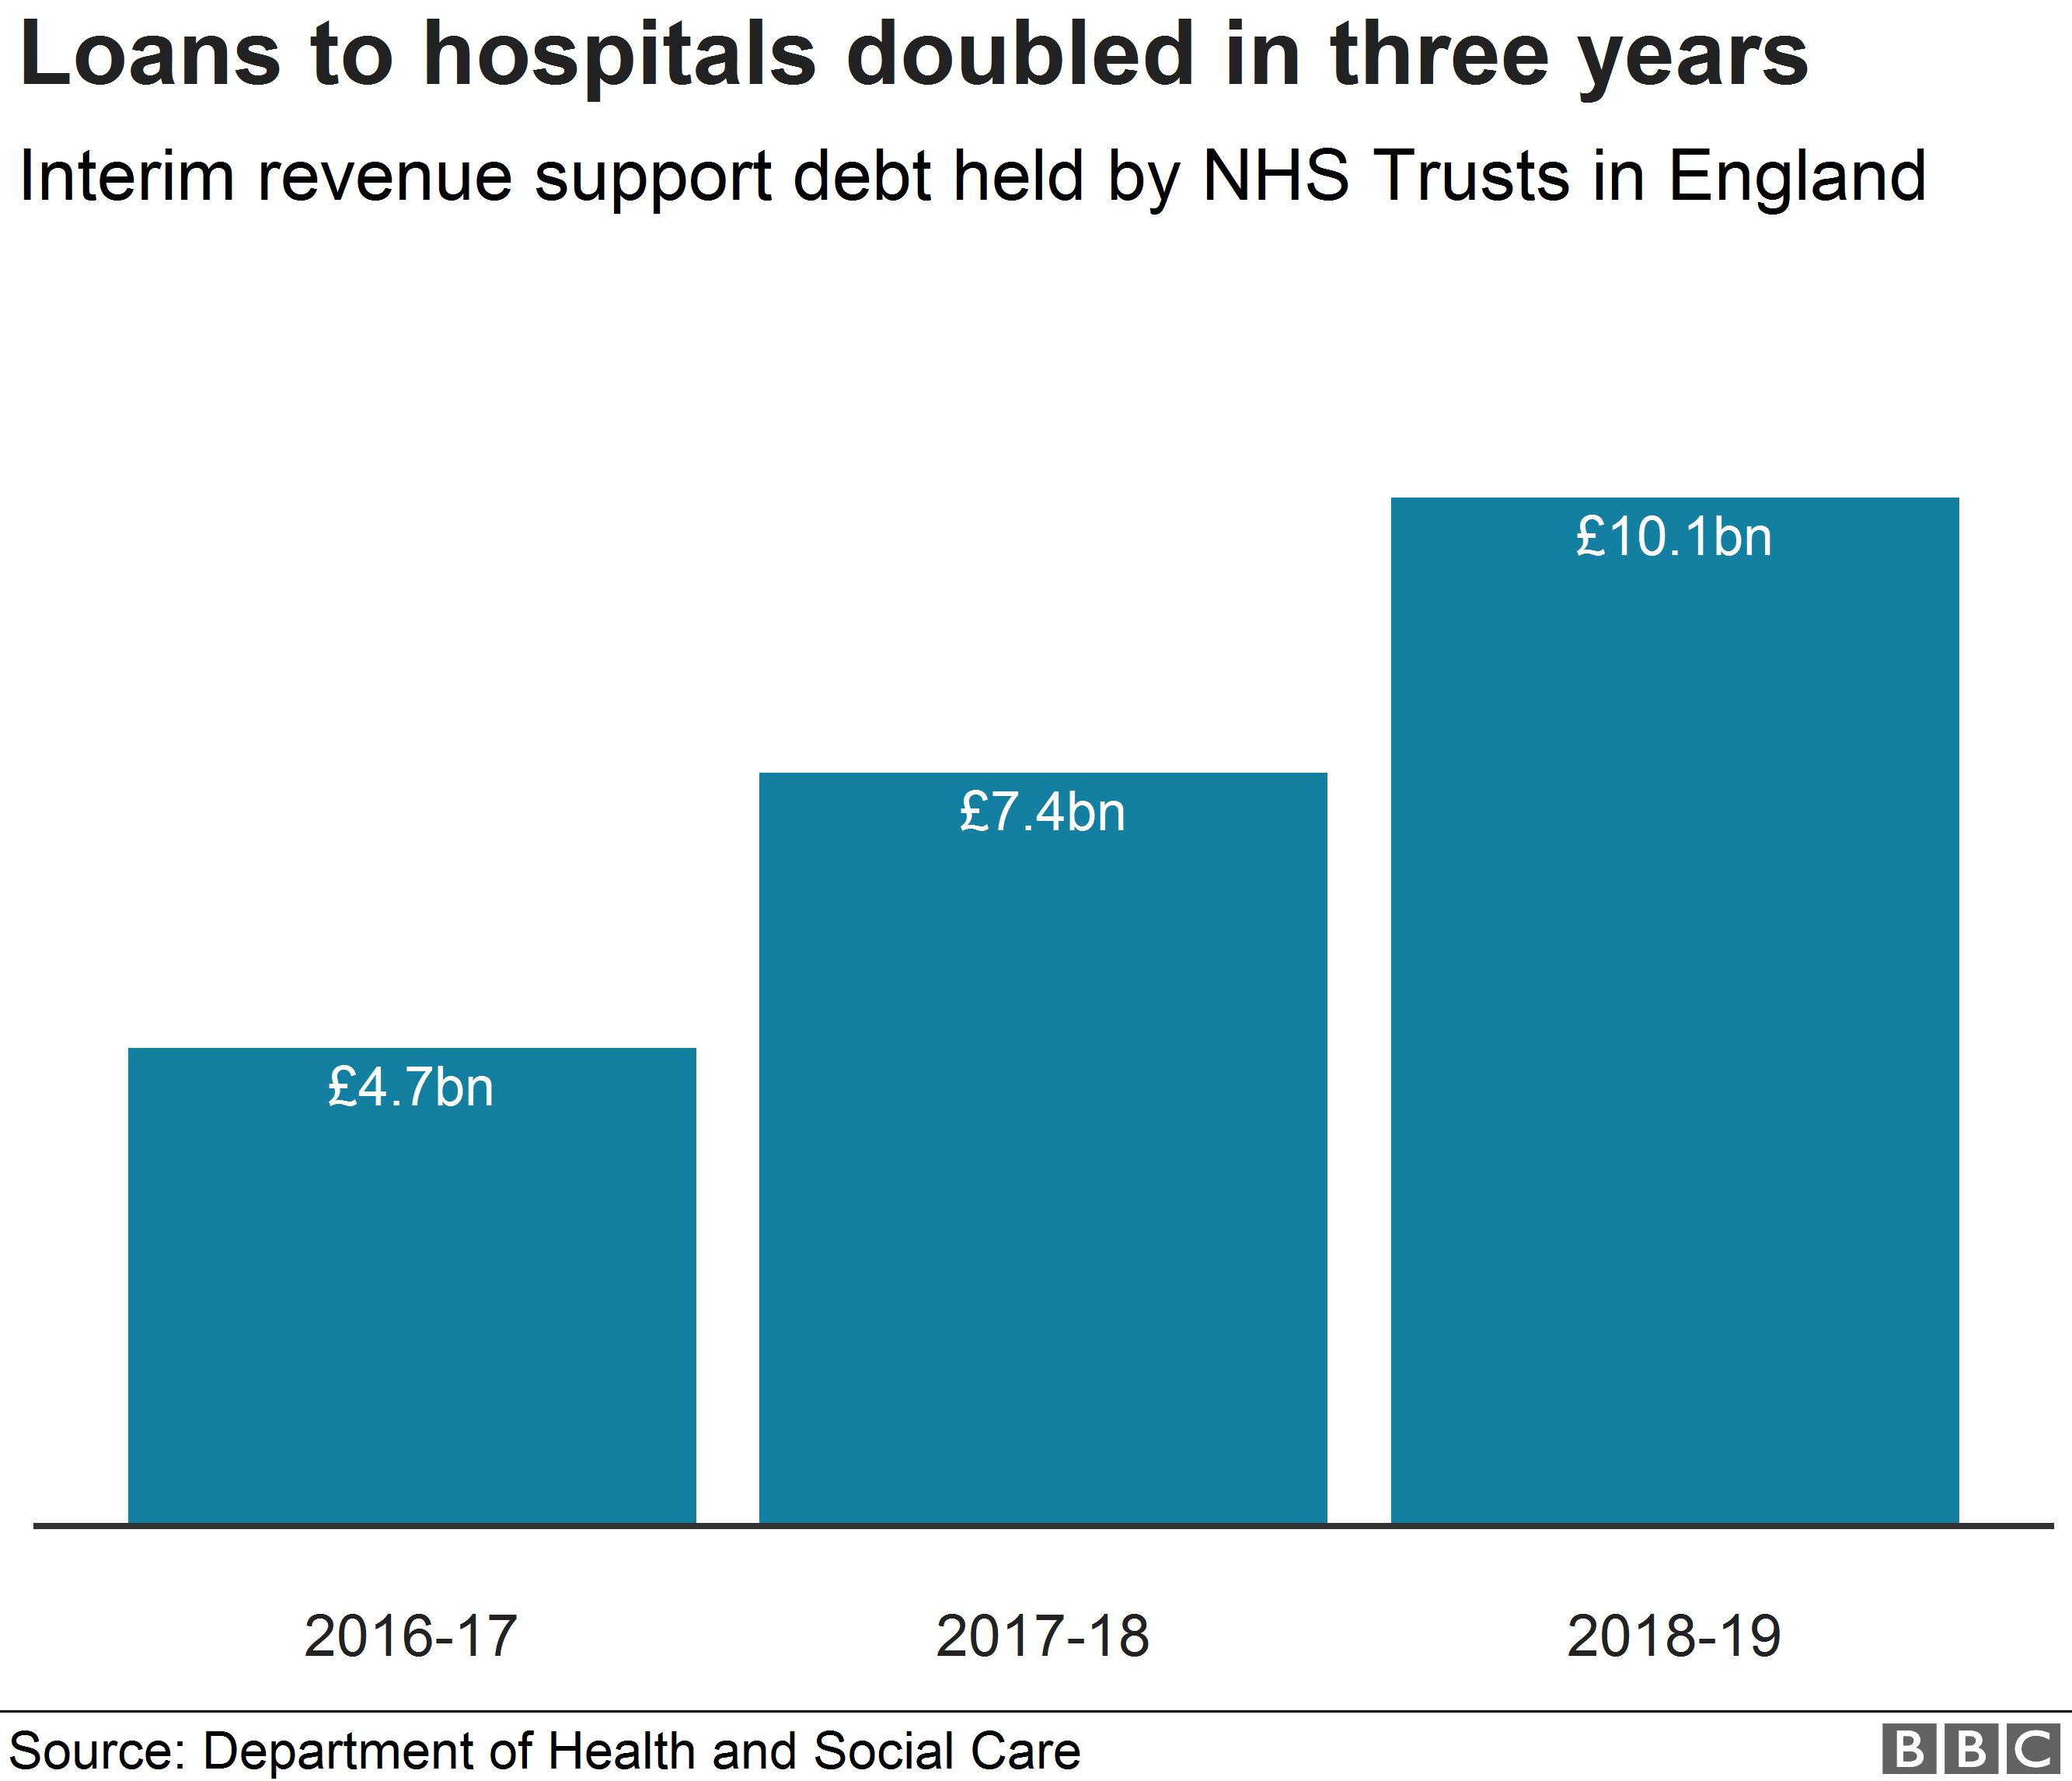 Total debt held by NHS trusts in England